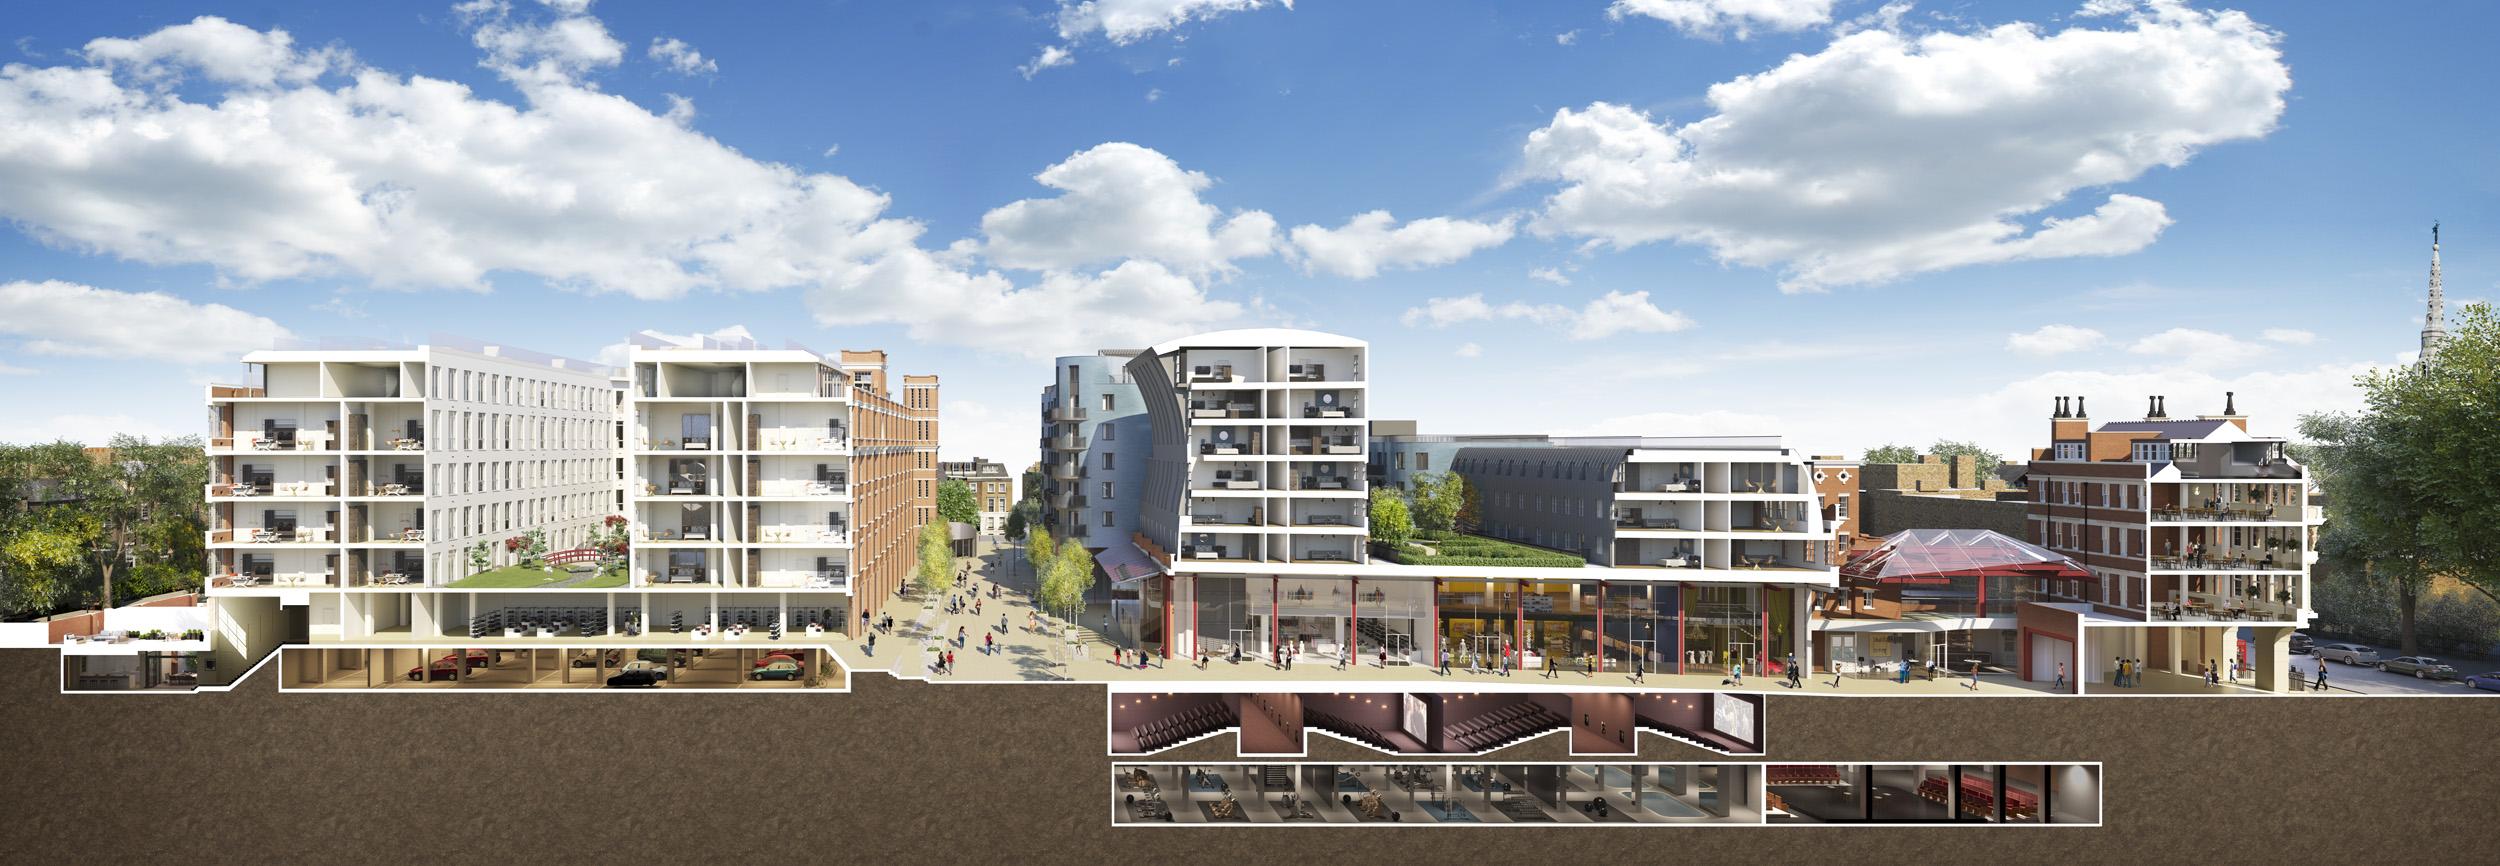 recent-spaces-islington-square-section